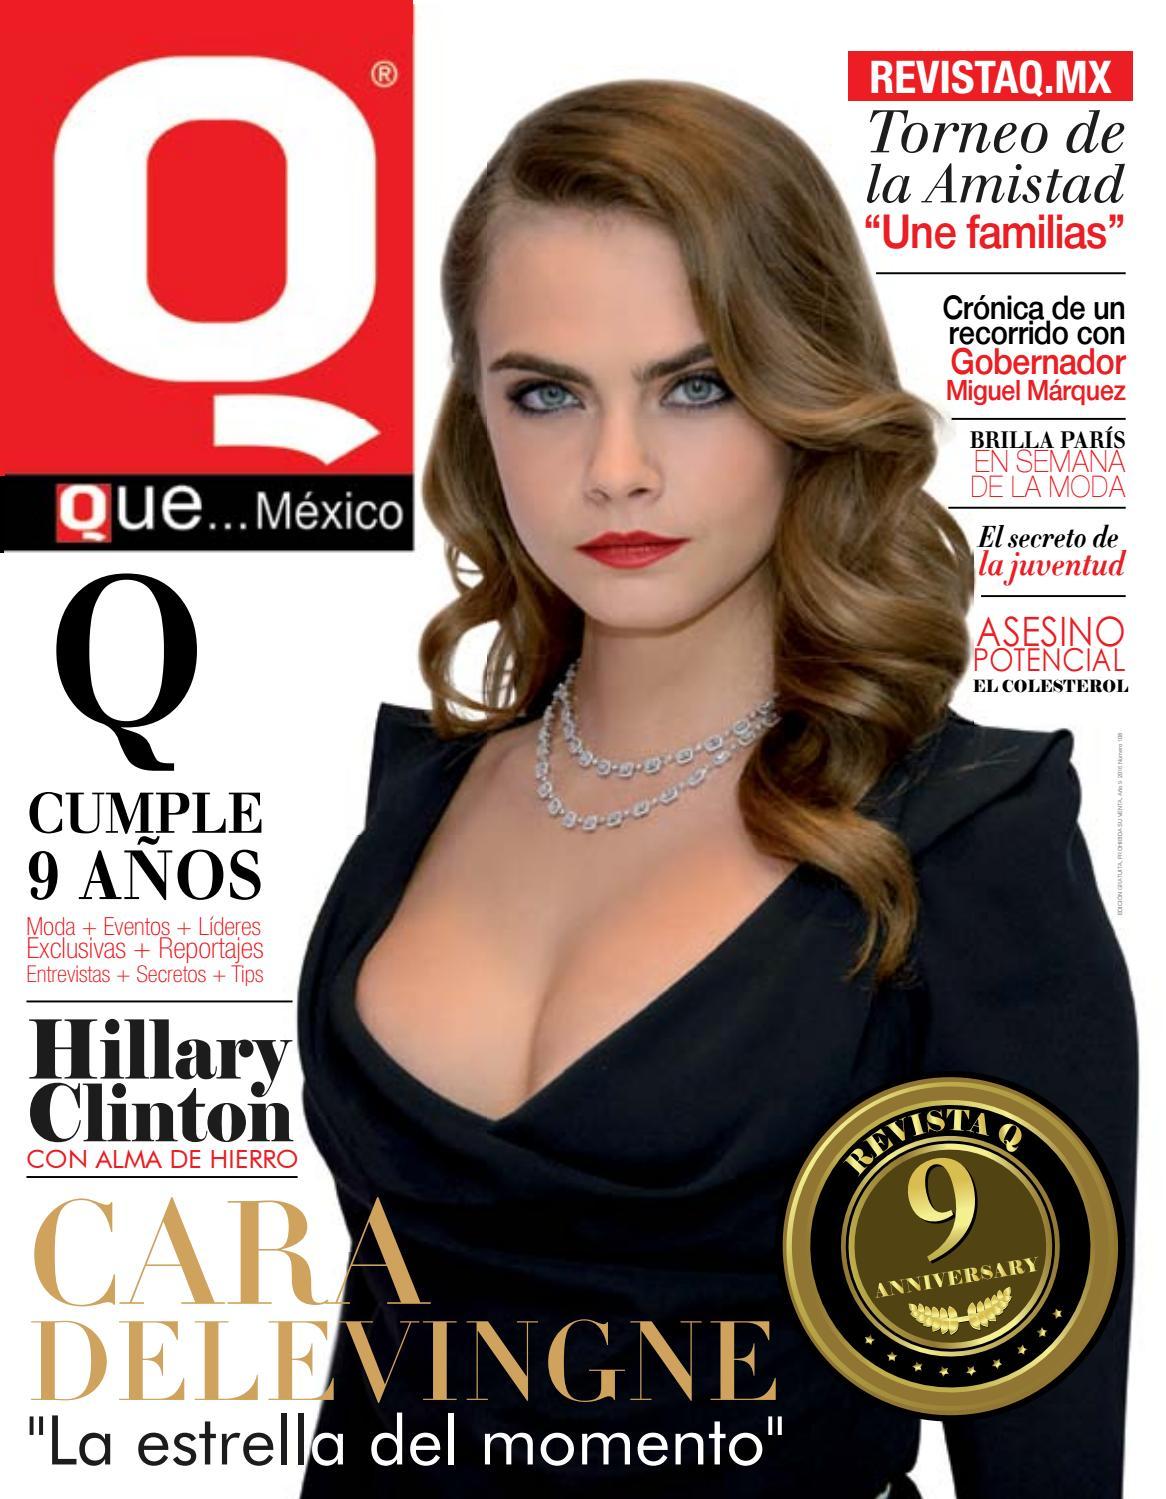 Revista Q 66 by Revista Q Que México - Issuu